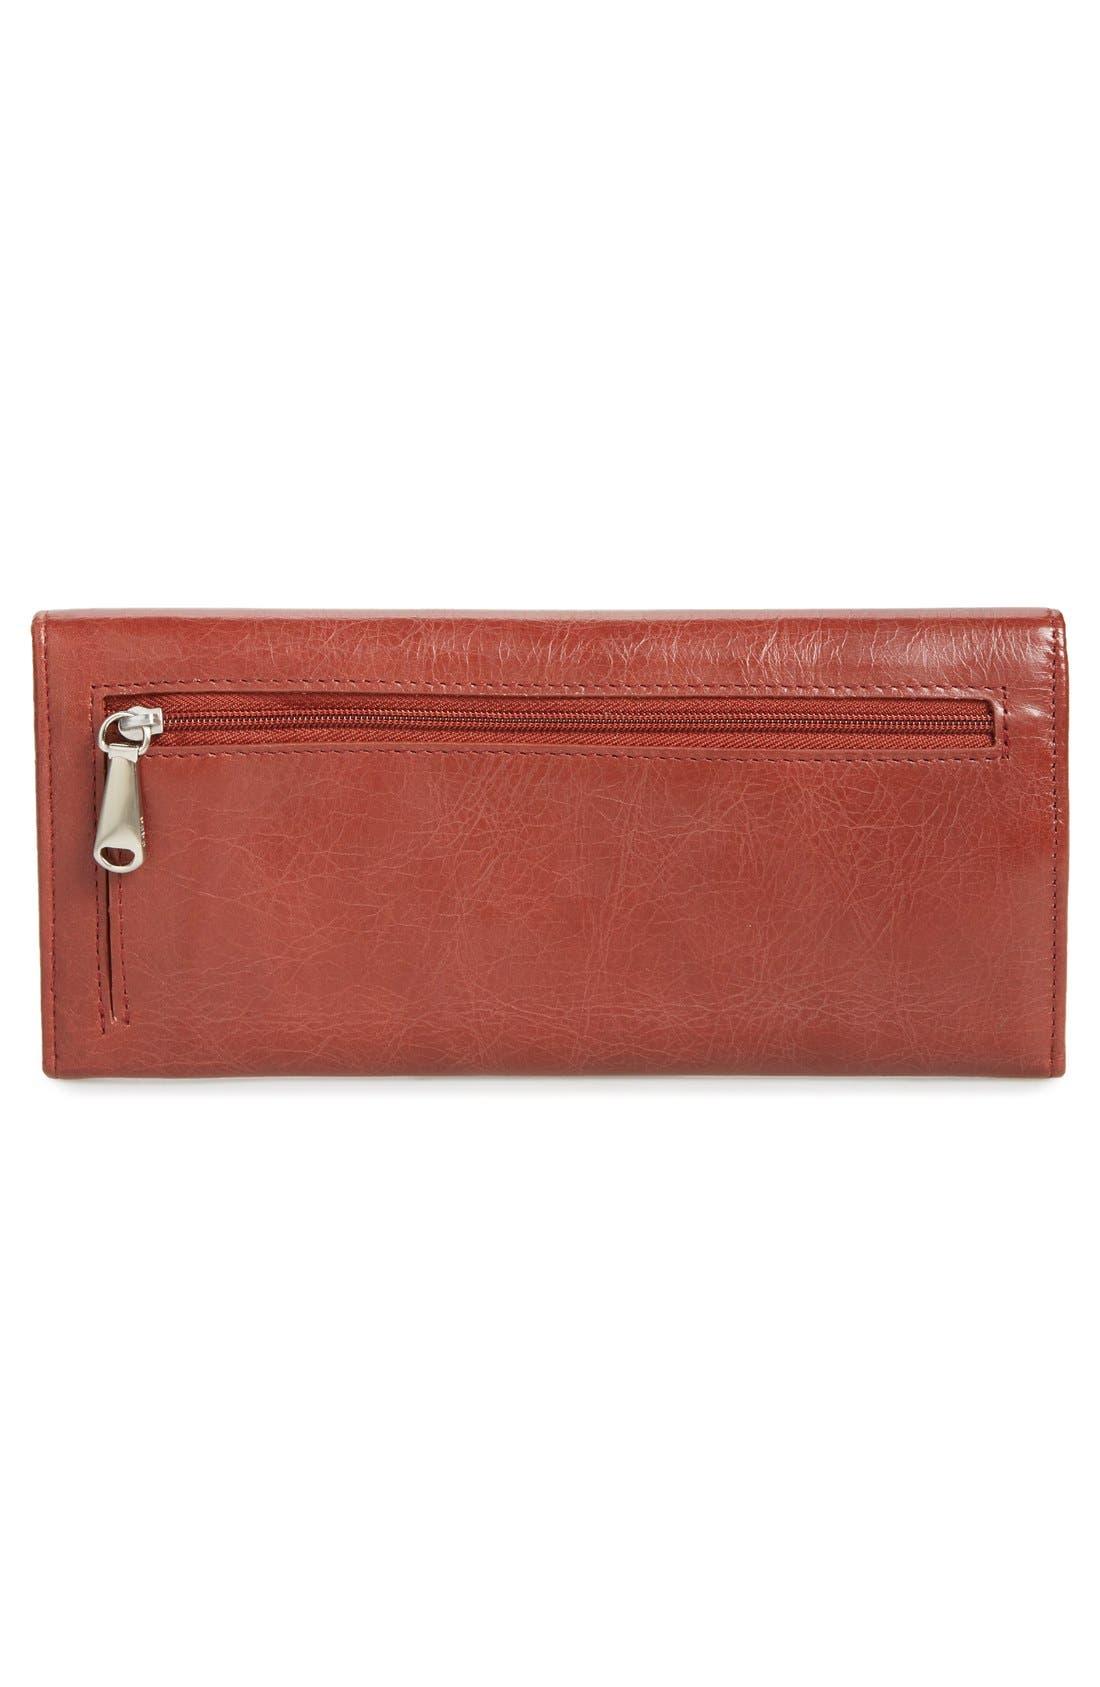 'Sadie' Leather Wallet,                             Alternate thumbnail 151, color,